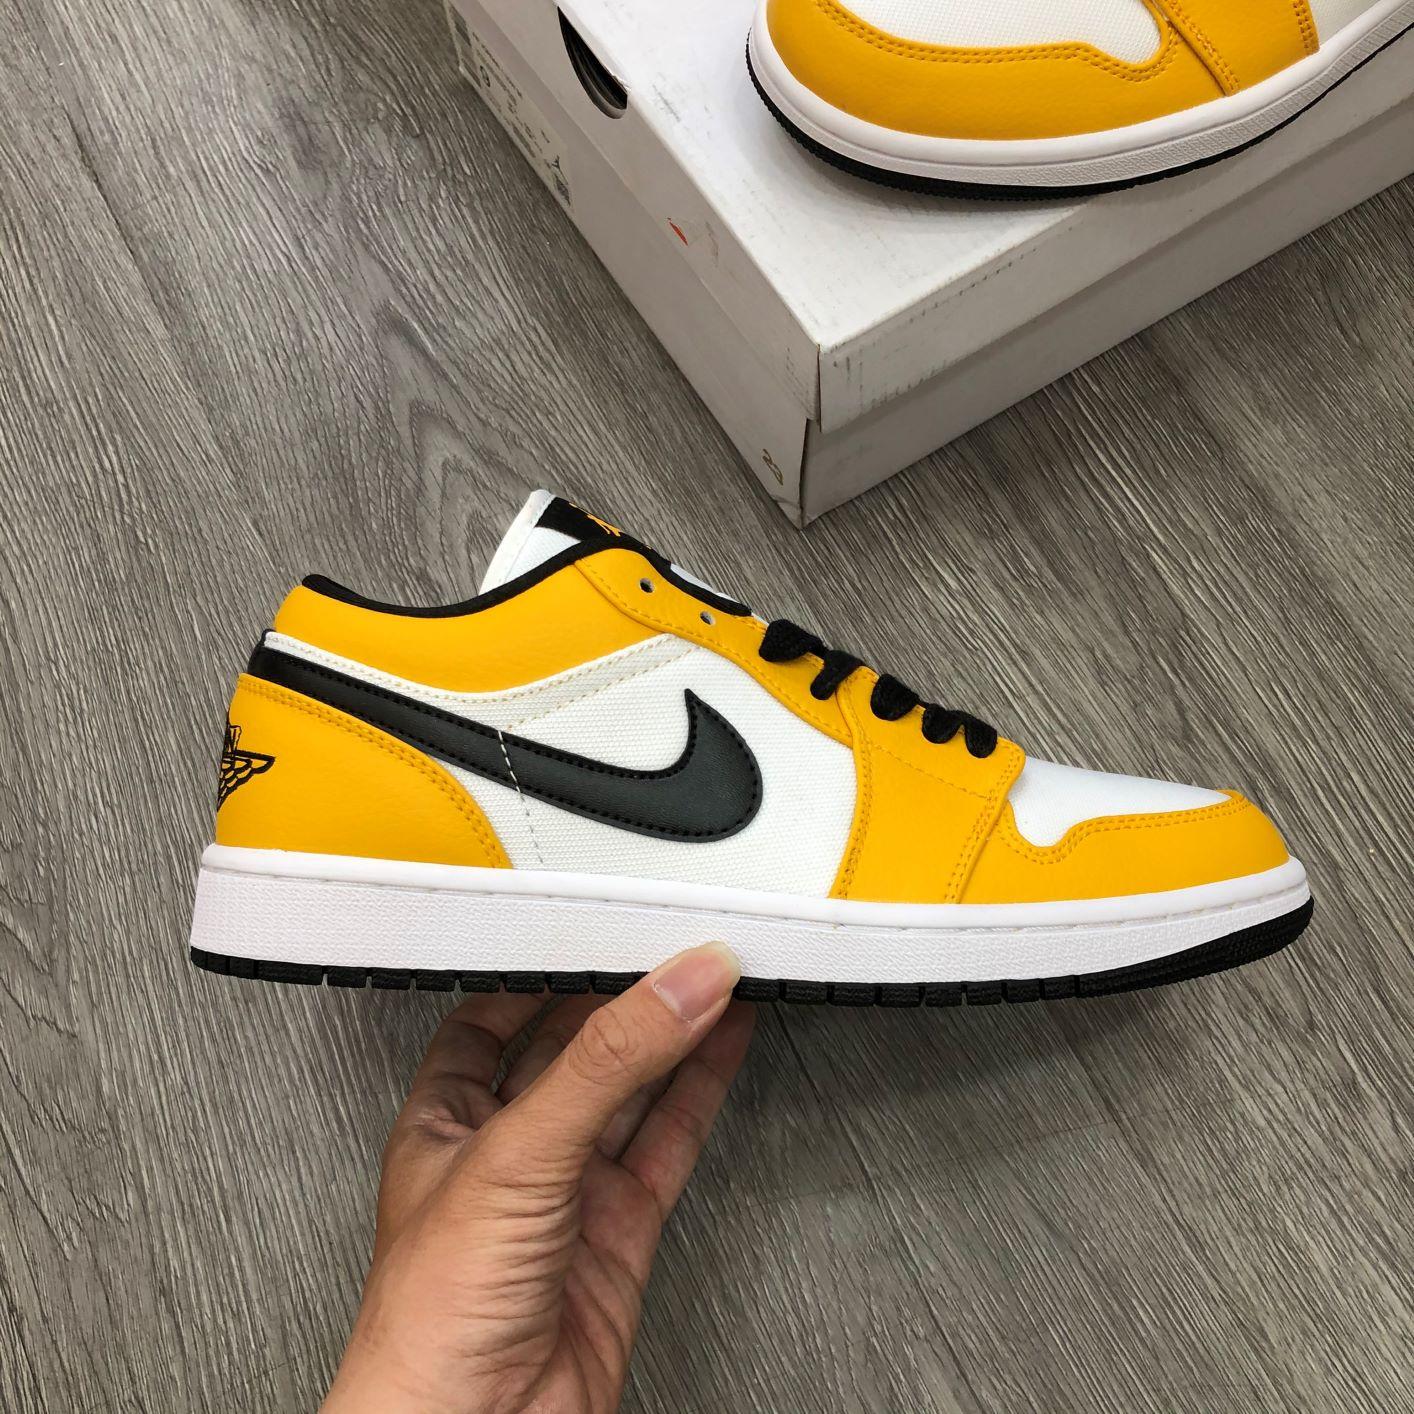 Giày Jordan1 Low Laser Orange